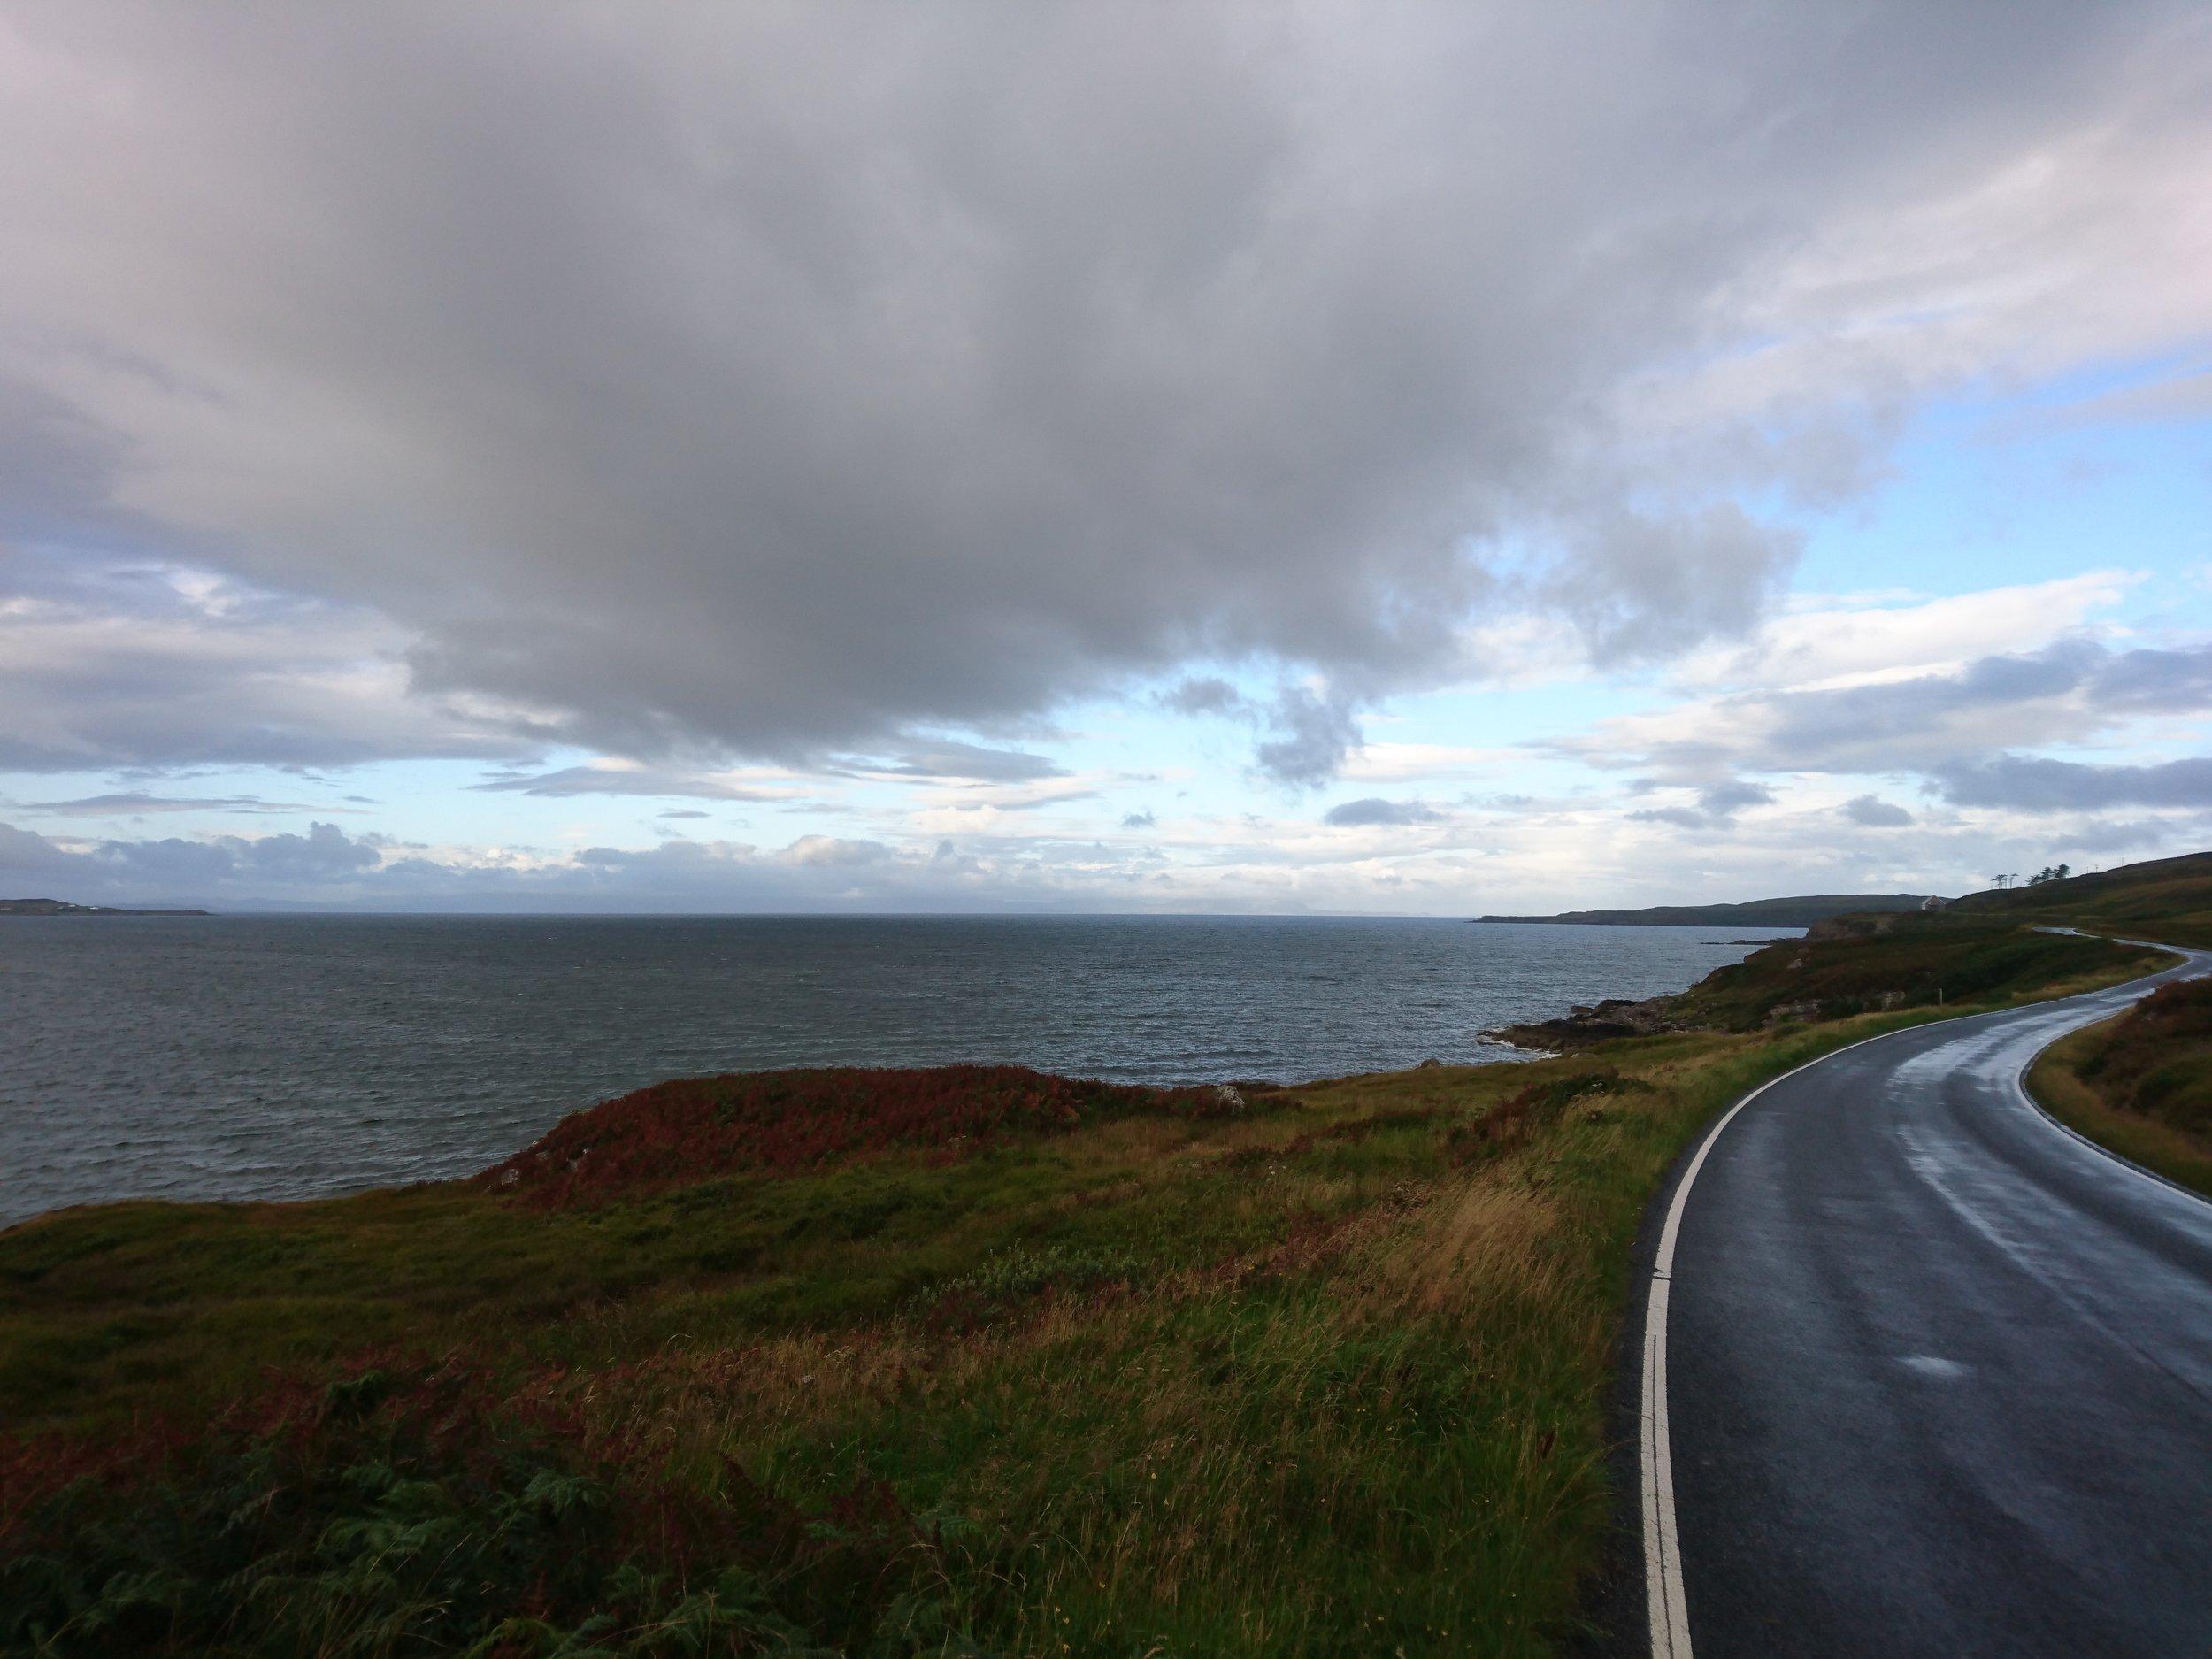 Winding Coastal Road